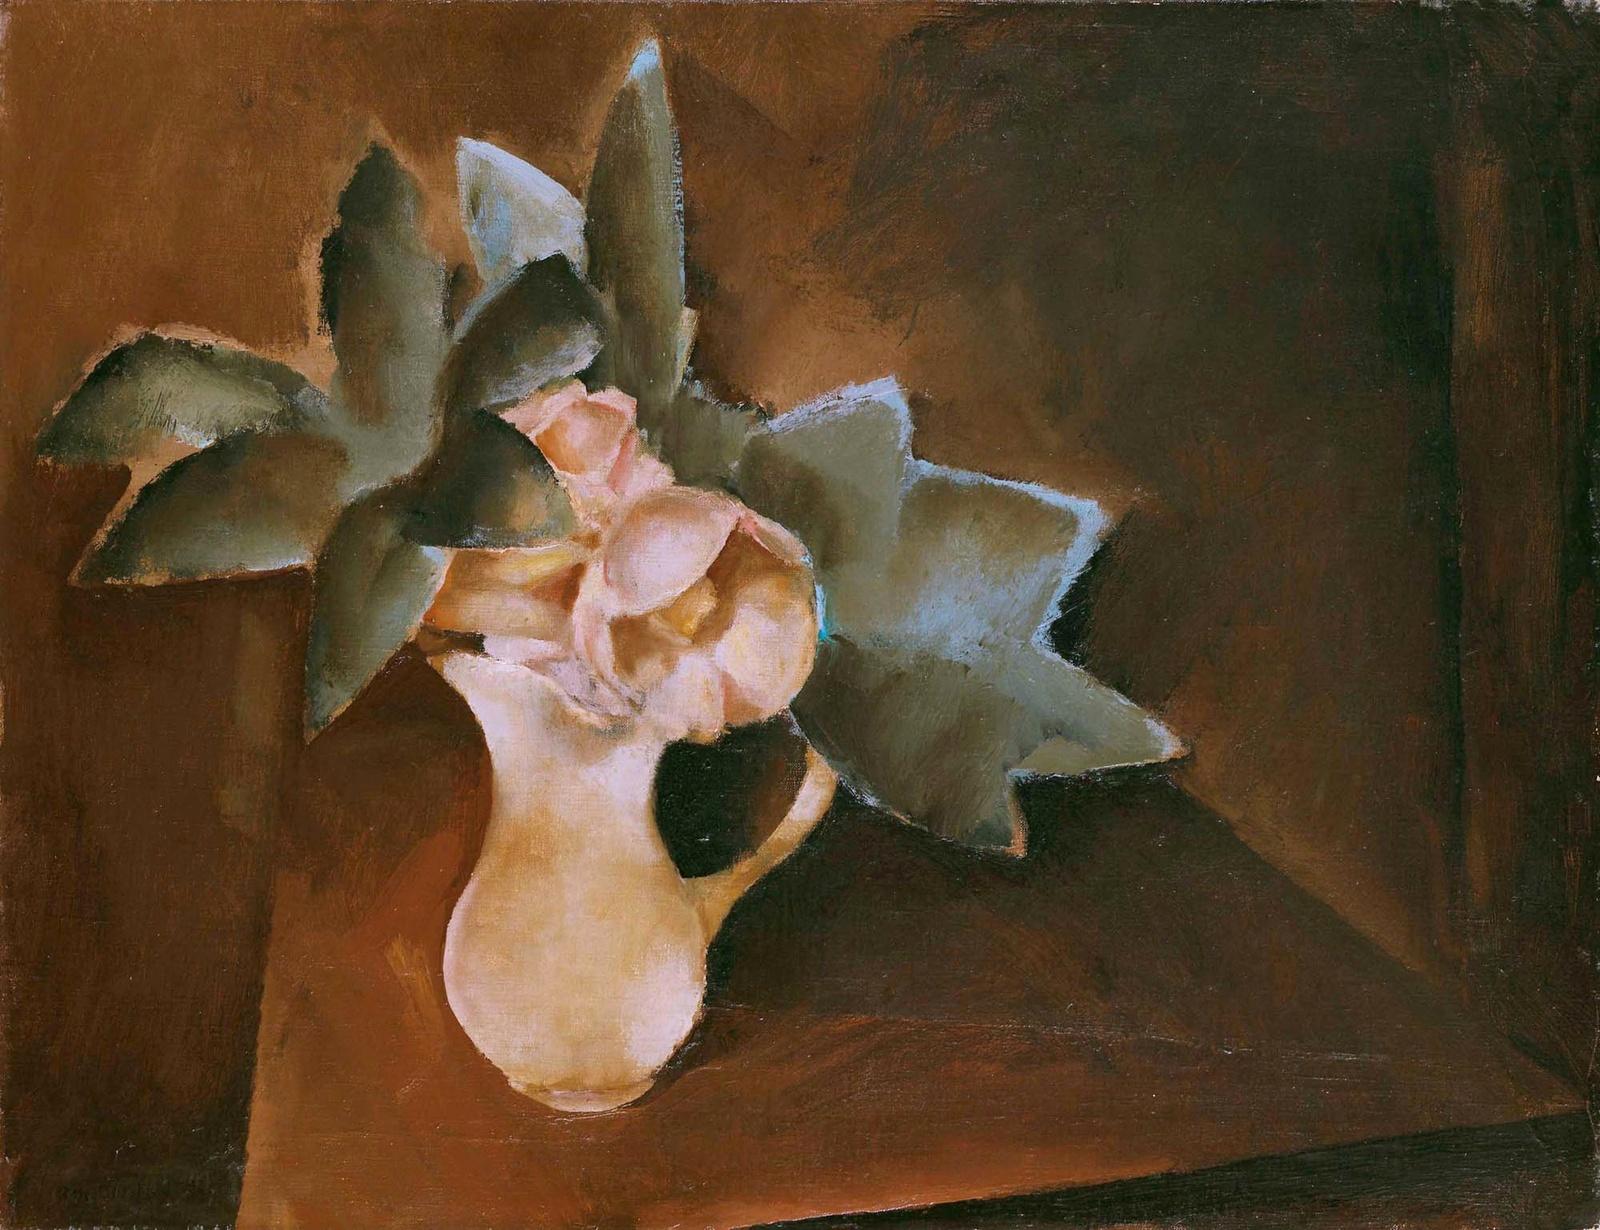 1924_Цветы в вазе (Fleurs dans une vase)_50 х 65_х.,м._Частное собрание.jpg